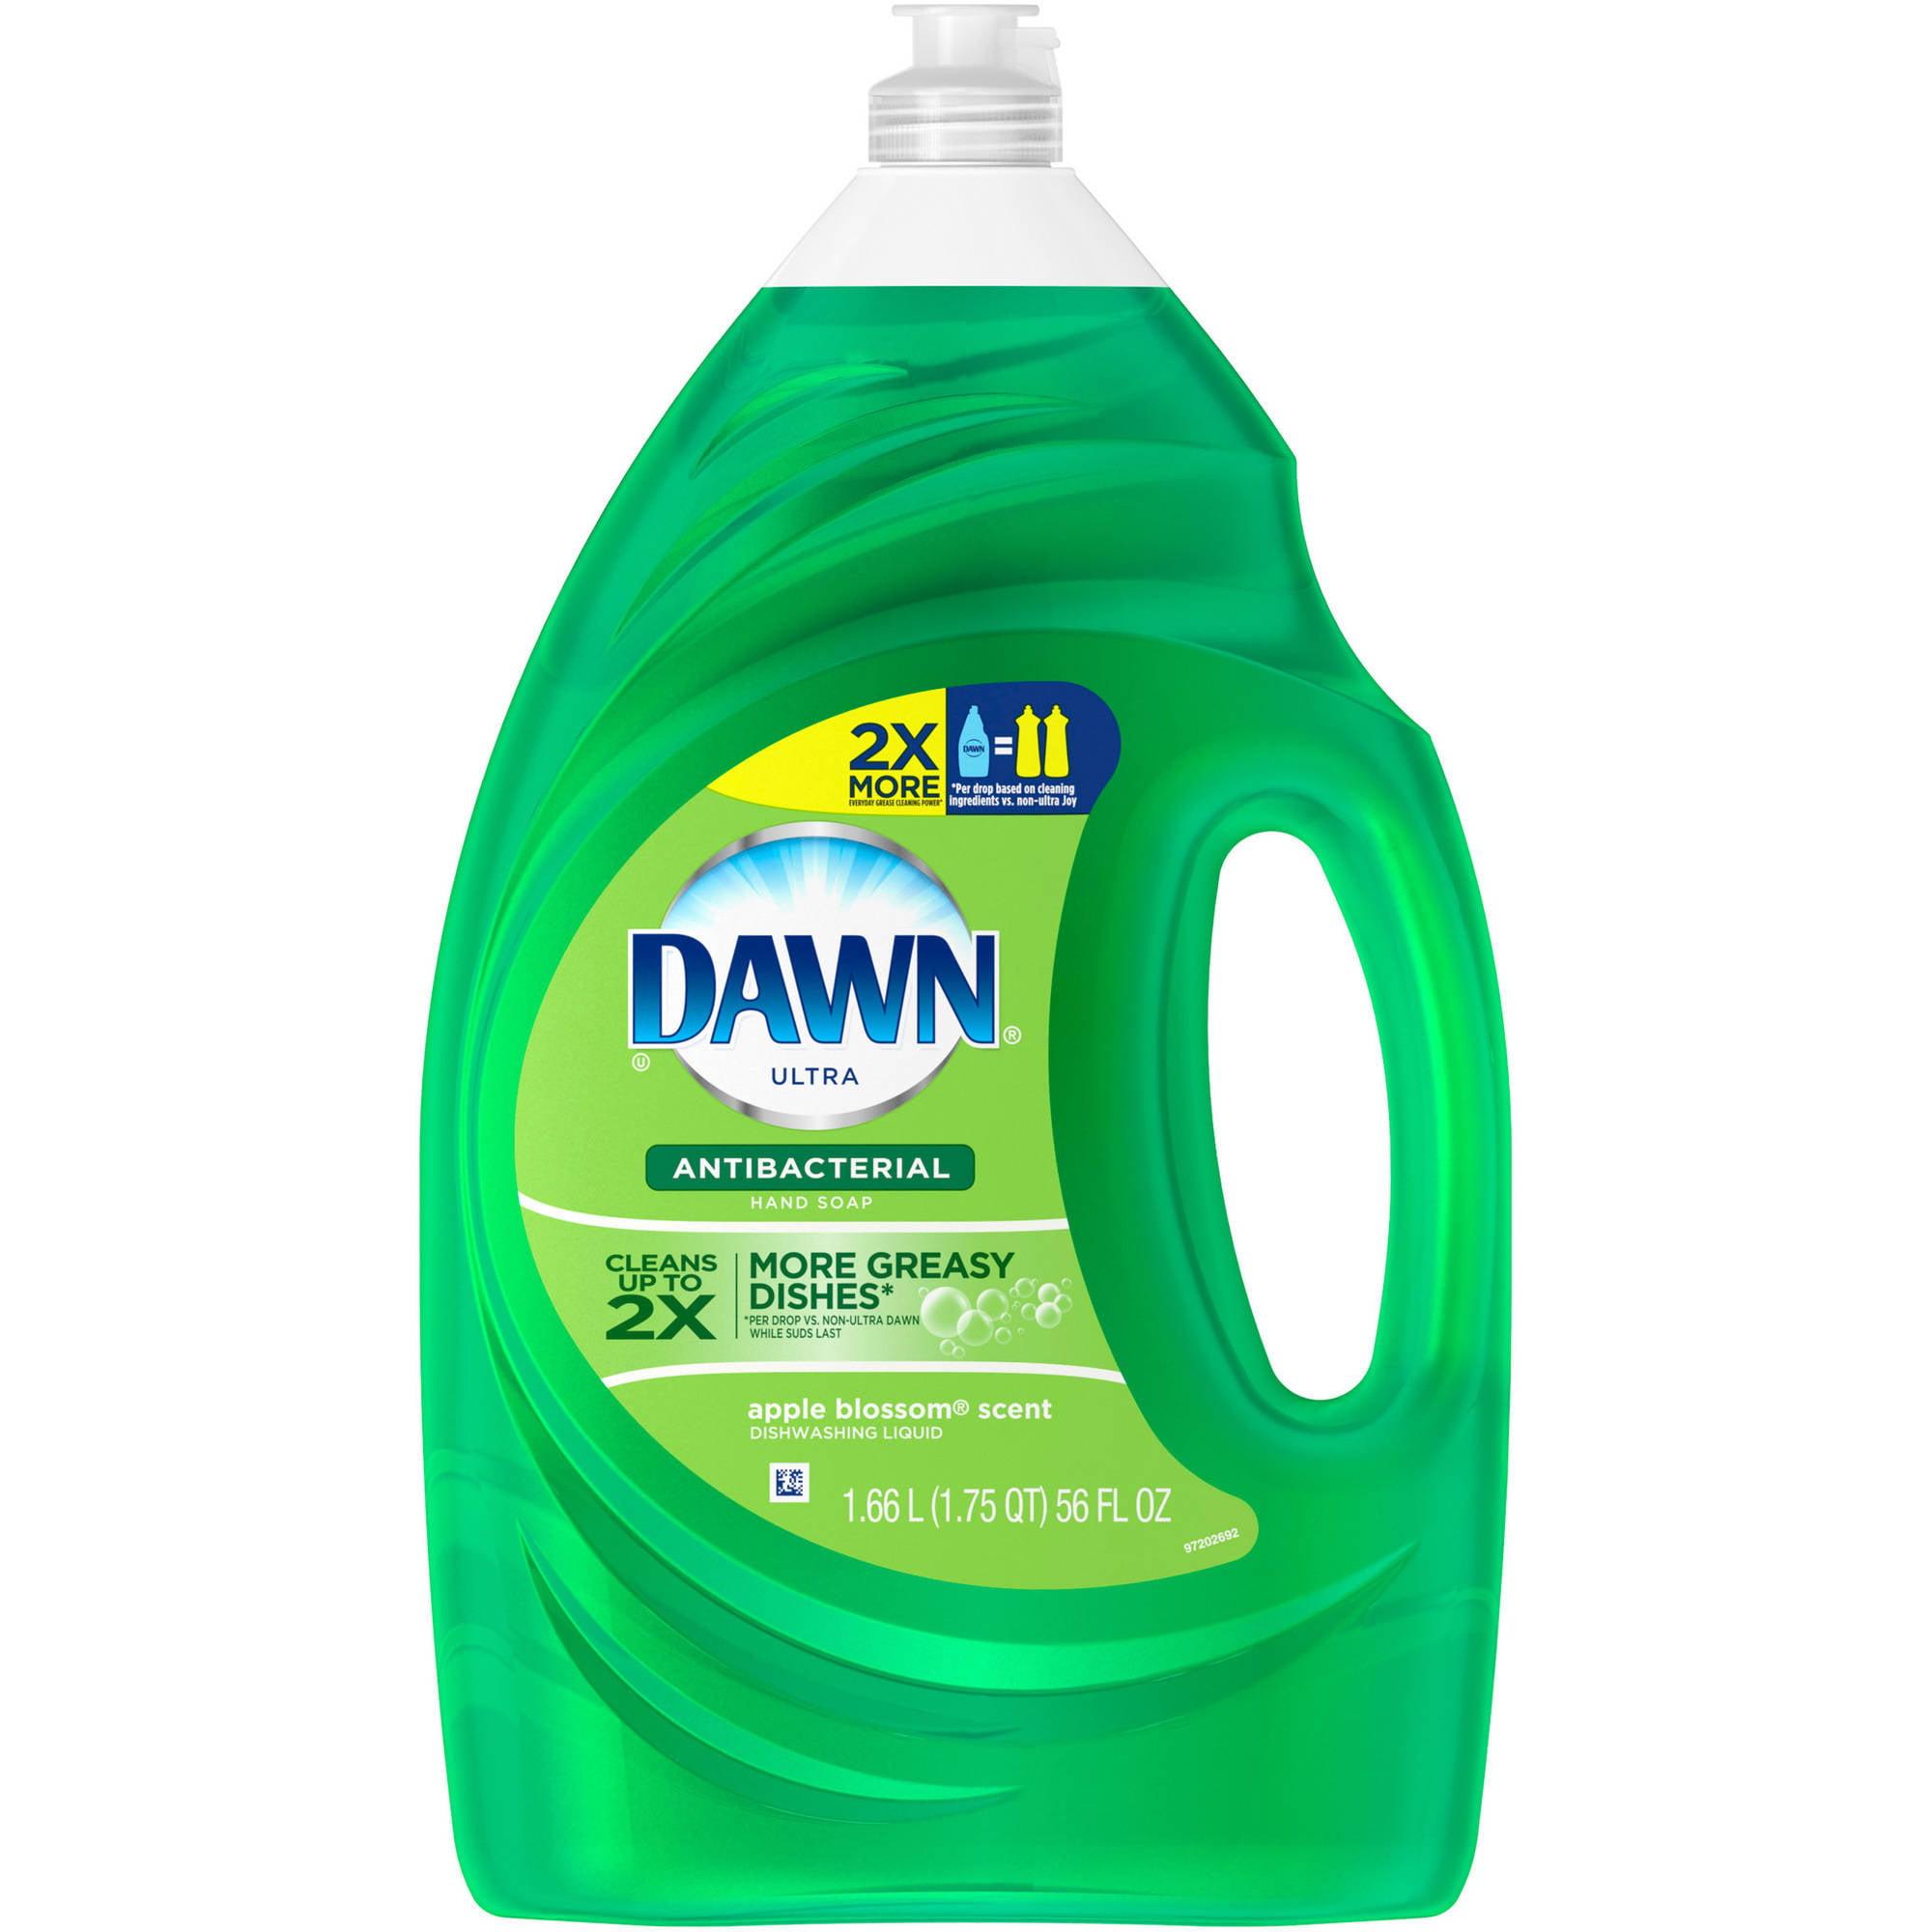 Dawn Ultra Antibacterial Dishwashing Liquid Apple Blossom (choose your size)